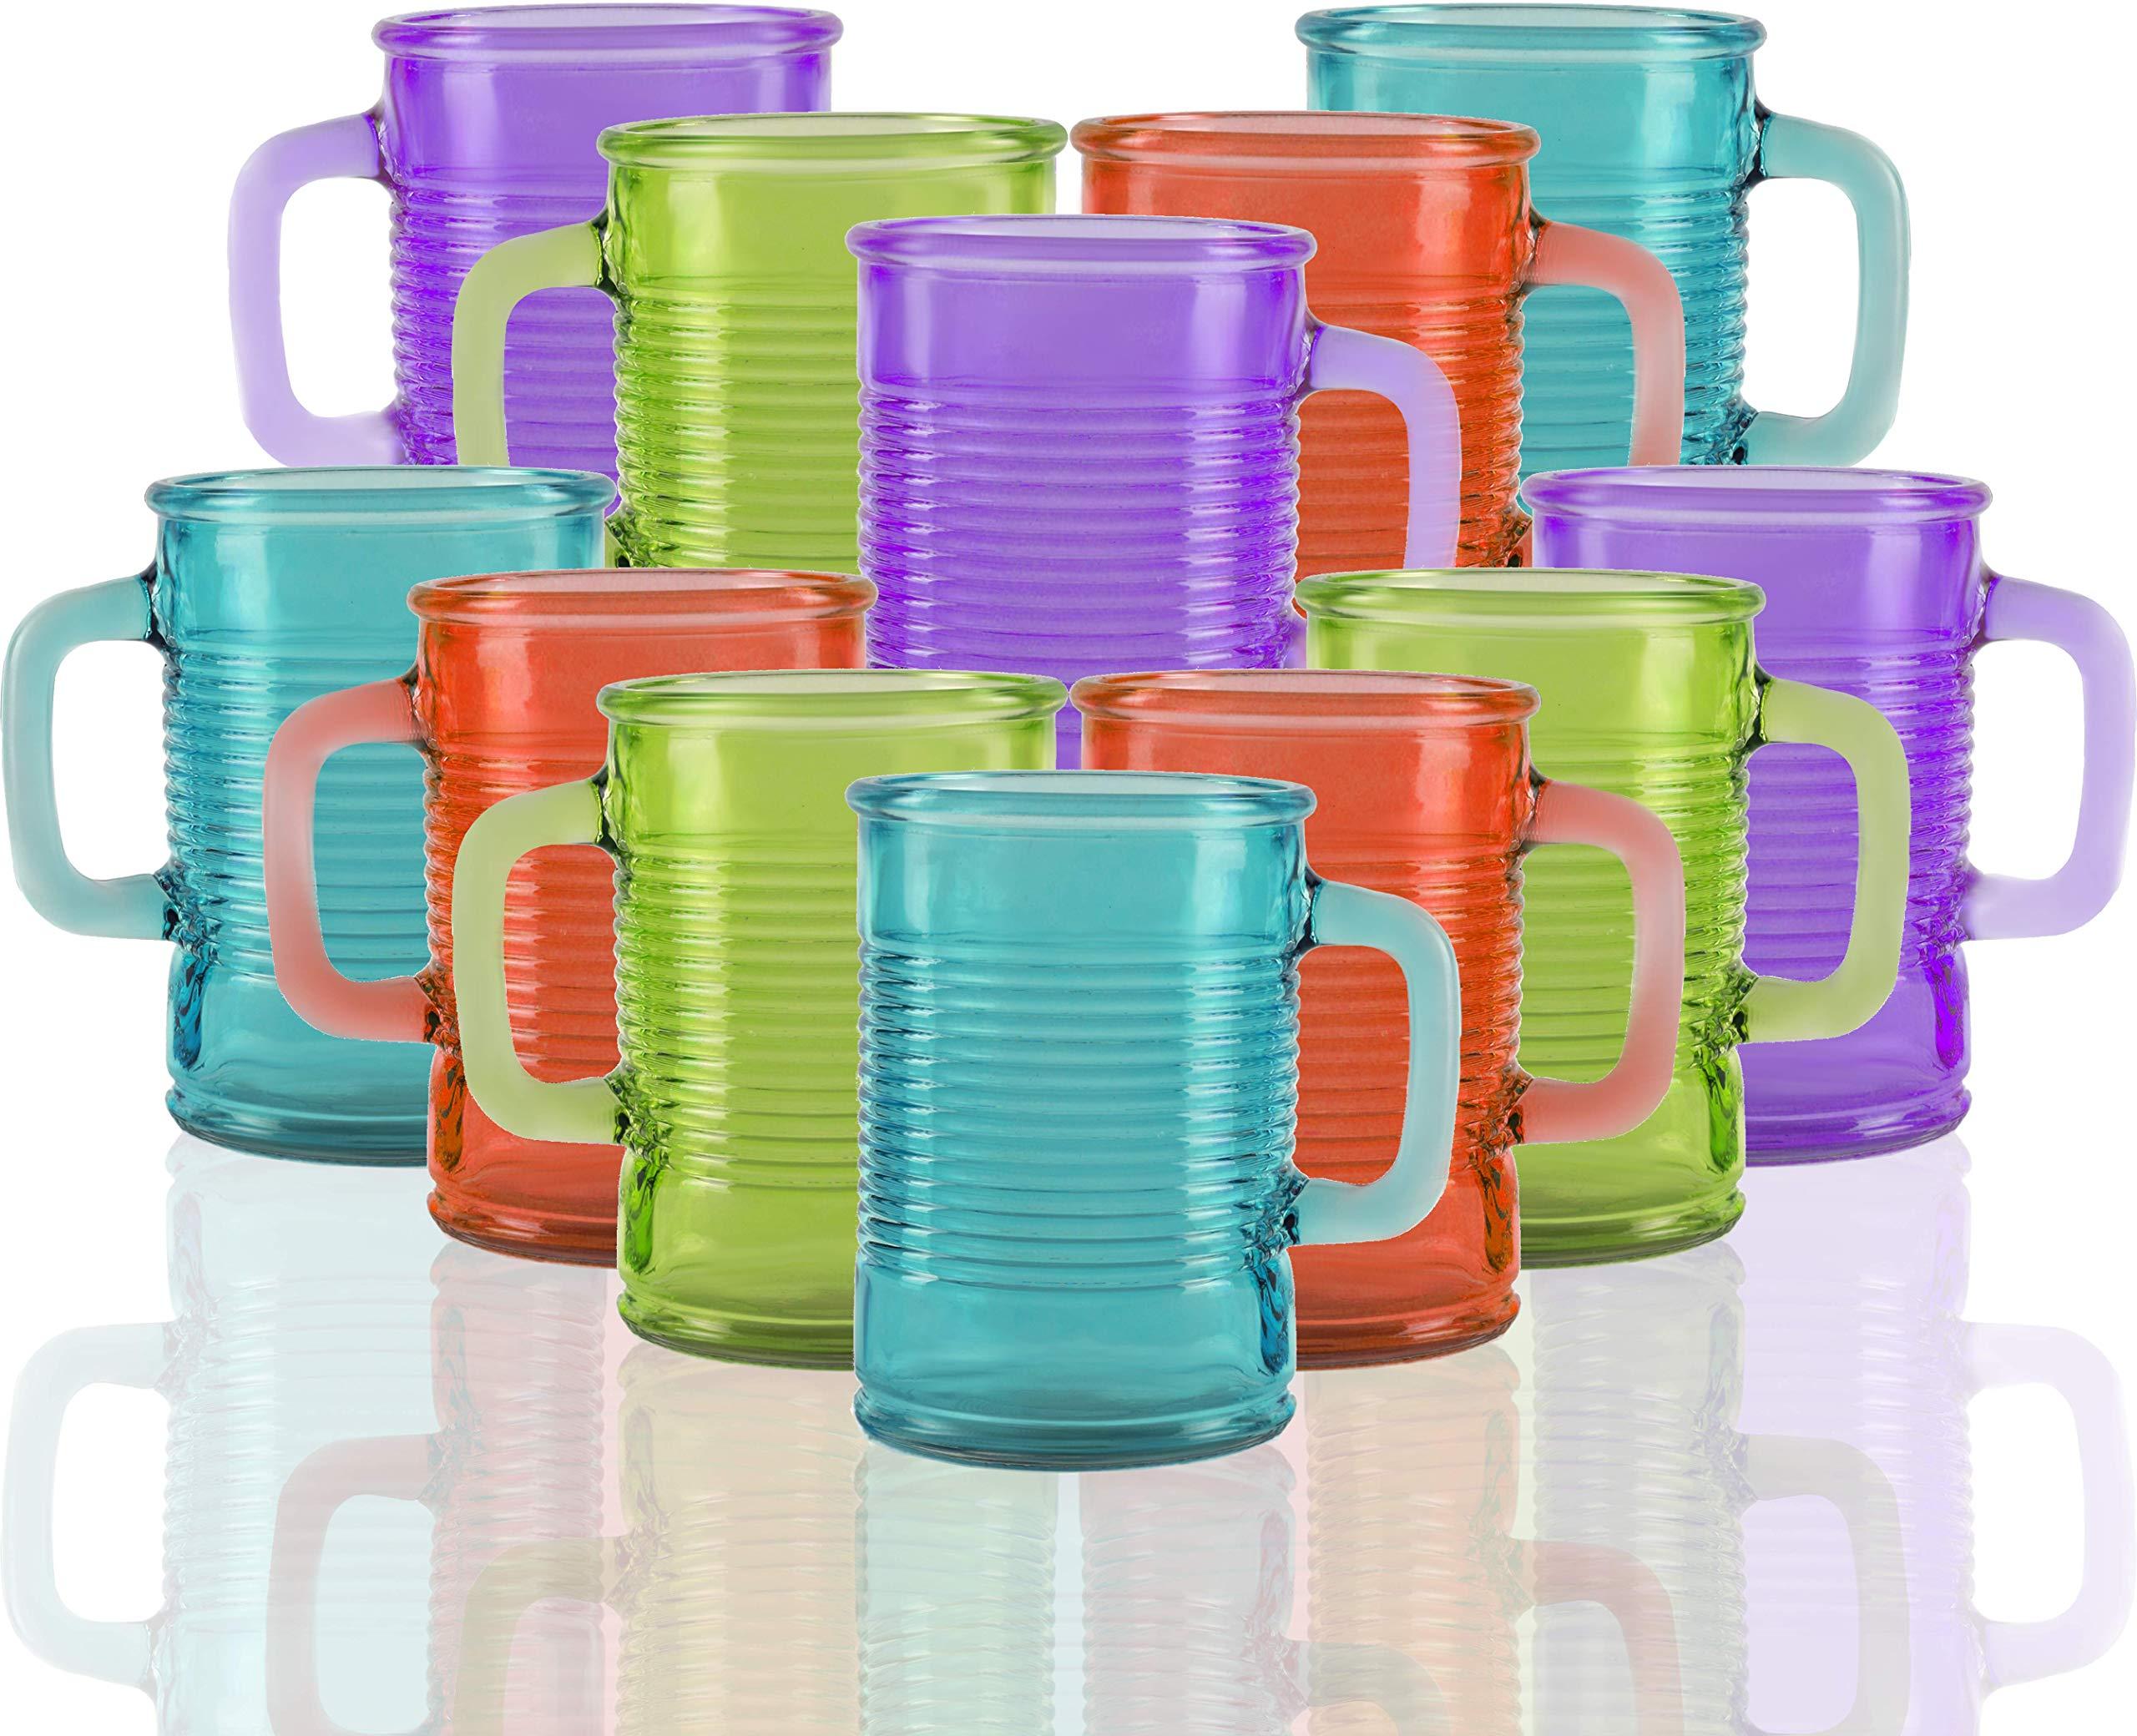 Circleware Huge Set of 12 Multi Colors Mason Jar Mugs in Fun Can Shaped Glasses, Farmhouse Decor Glassware Drink Tumblers for Water, Beer & Cold Beverages, 17.5 oz, Aqua, Green, Orange, Purple